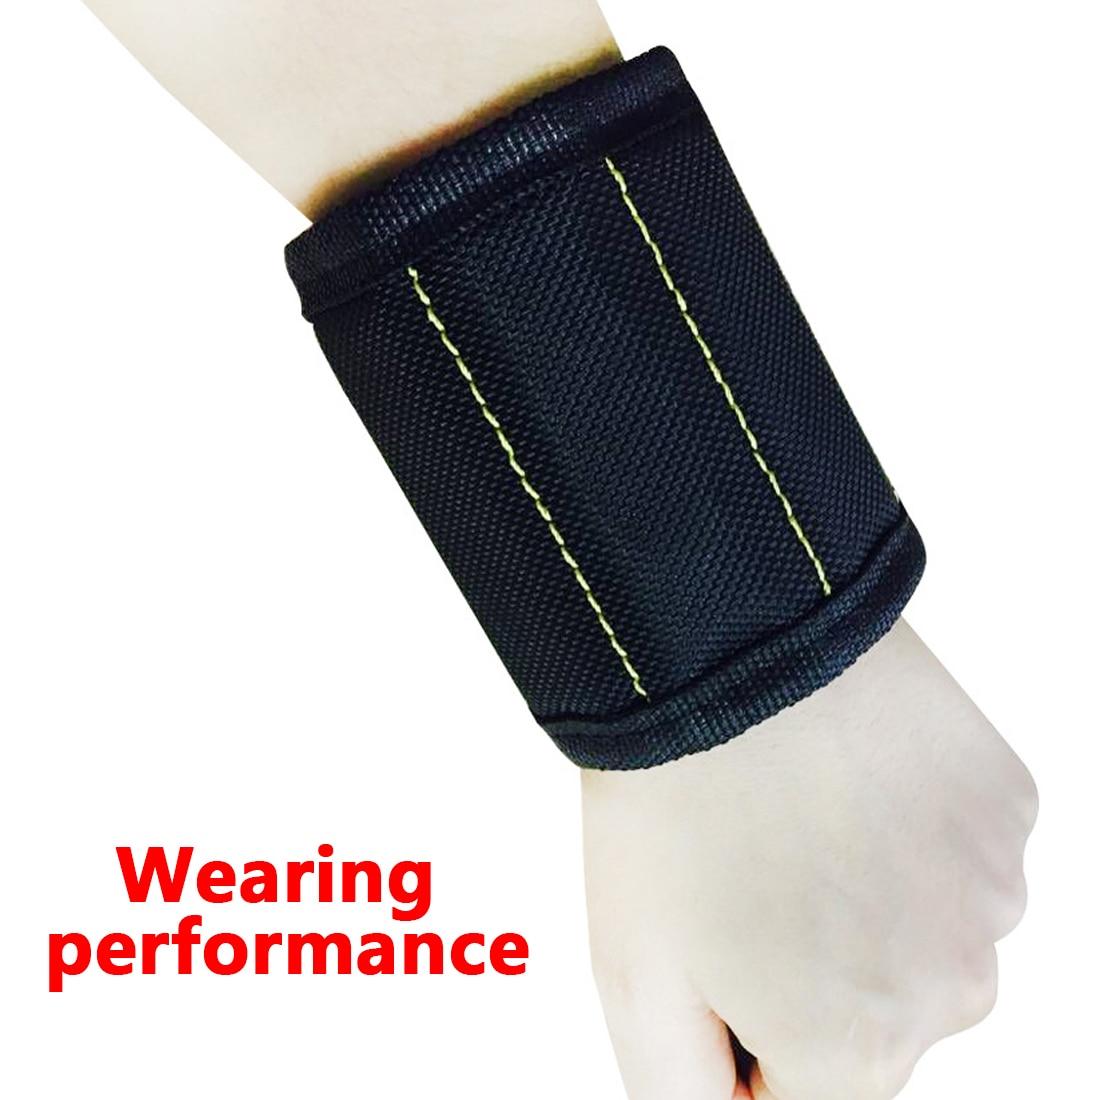 Hand Tool Bag Bracelet Belt 370mm Nylon Wrist Strong Magnetic Nail Screw Drill Bit Holder Wristband Holding Car Auto Repair Kit